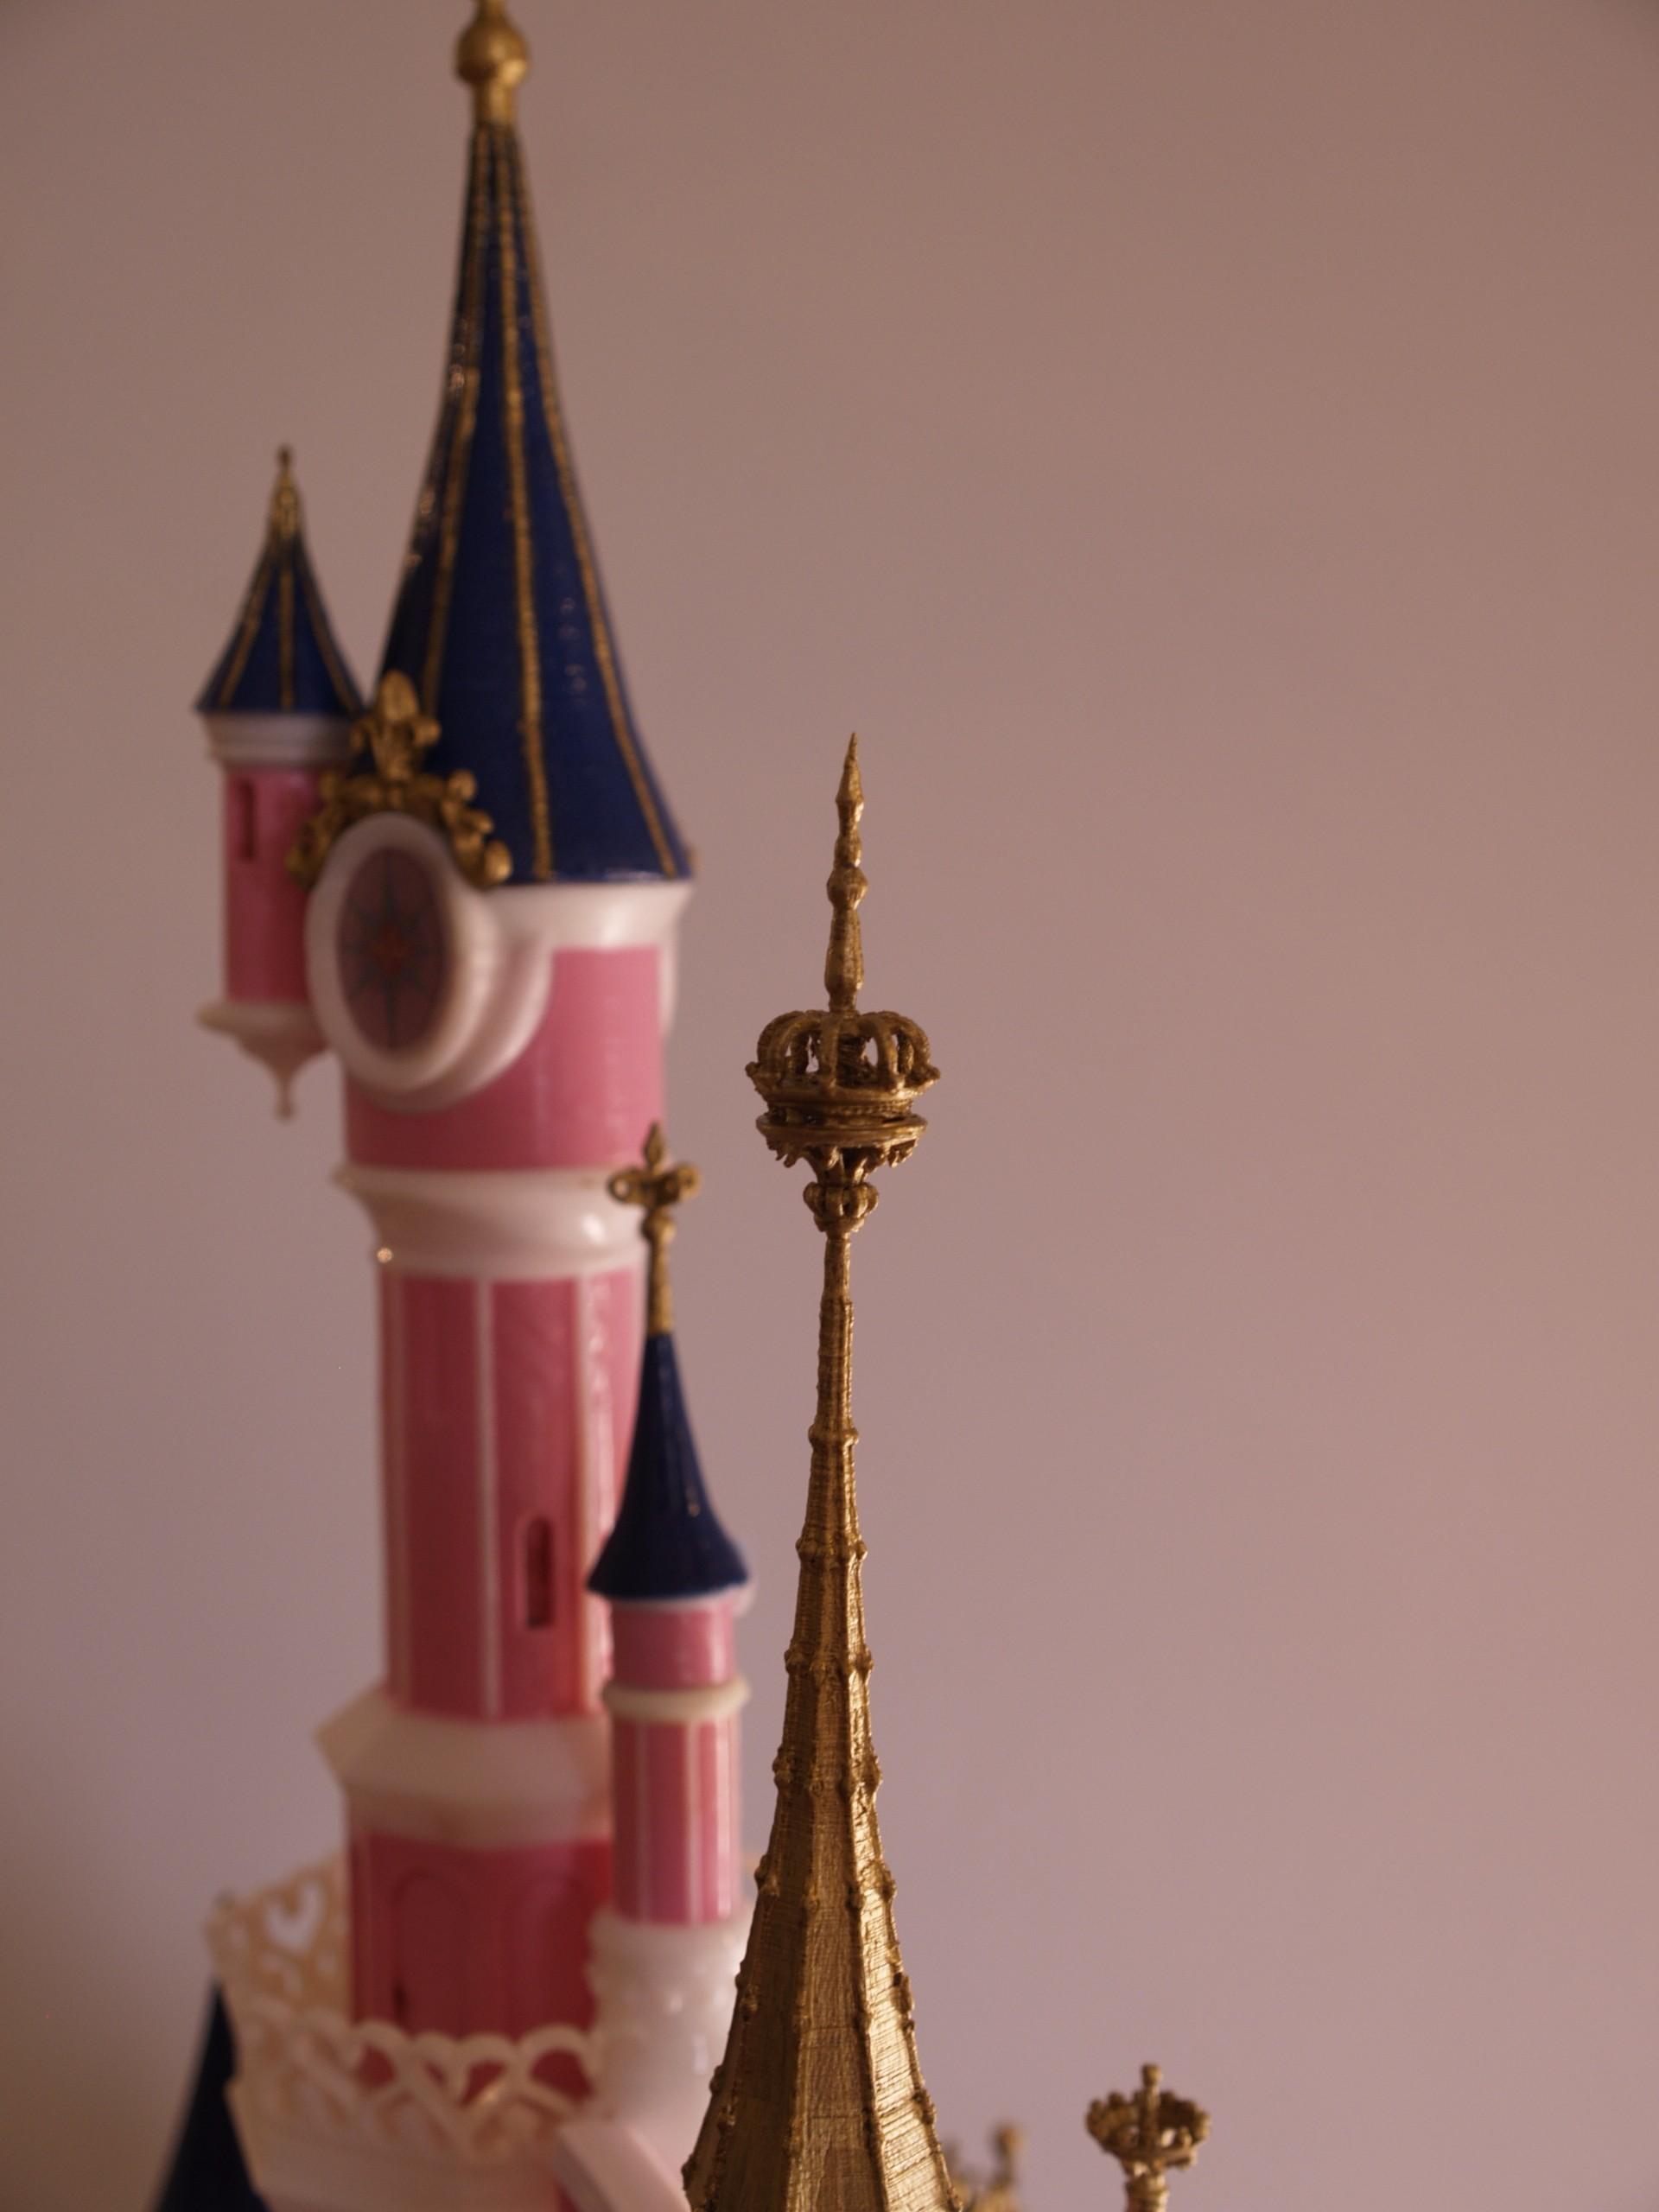 _A097907.JPG Download free STL file Chateau Disneyland Paris with Prusa MK2S MMU (Ed2) • 3D print model, Rio31